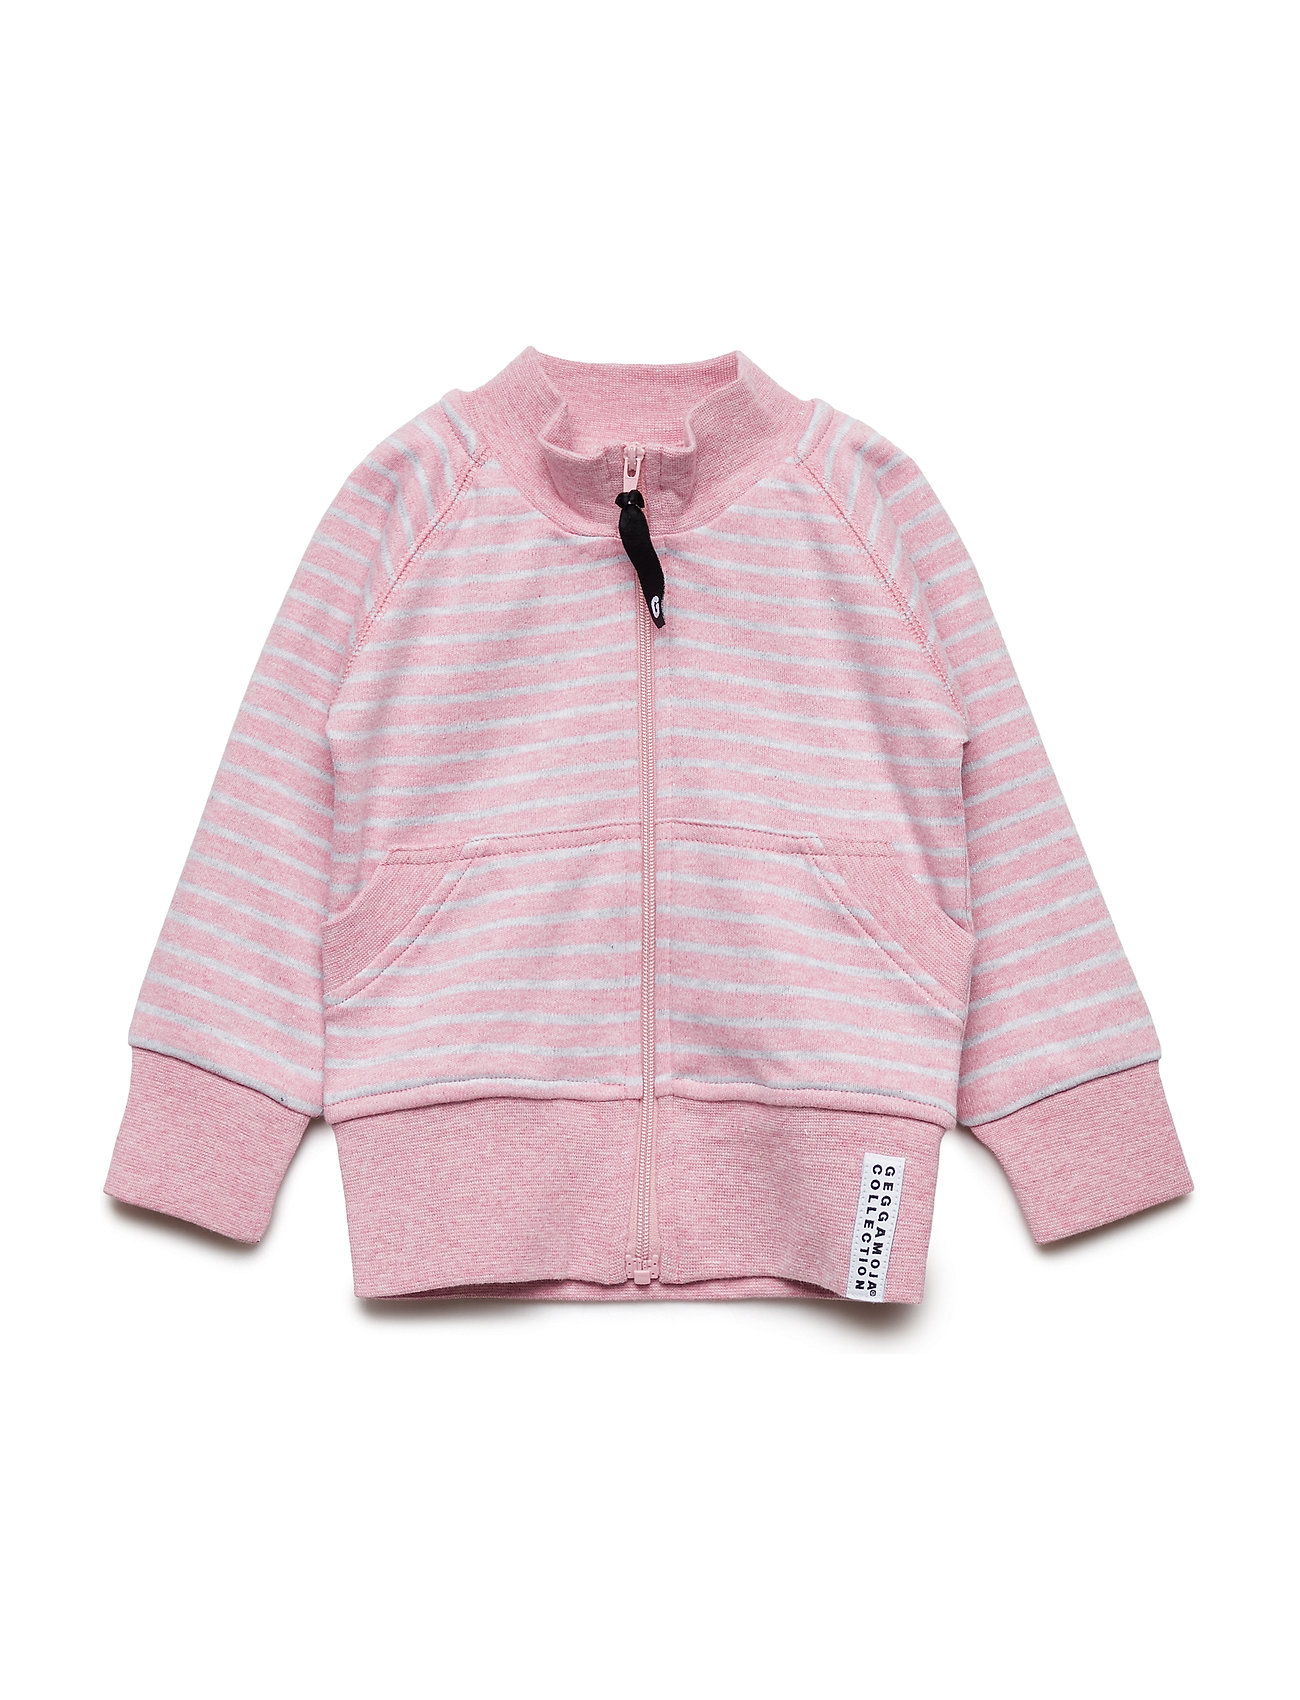 Geggamoja Zipsweater Classic - PINK DAISY STRIPE